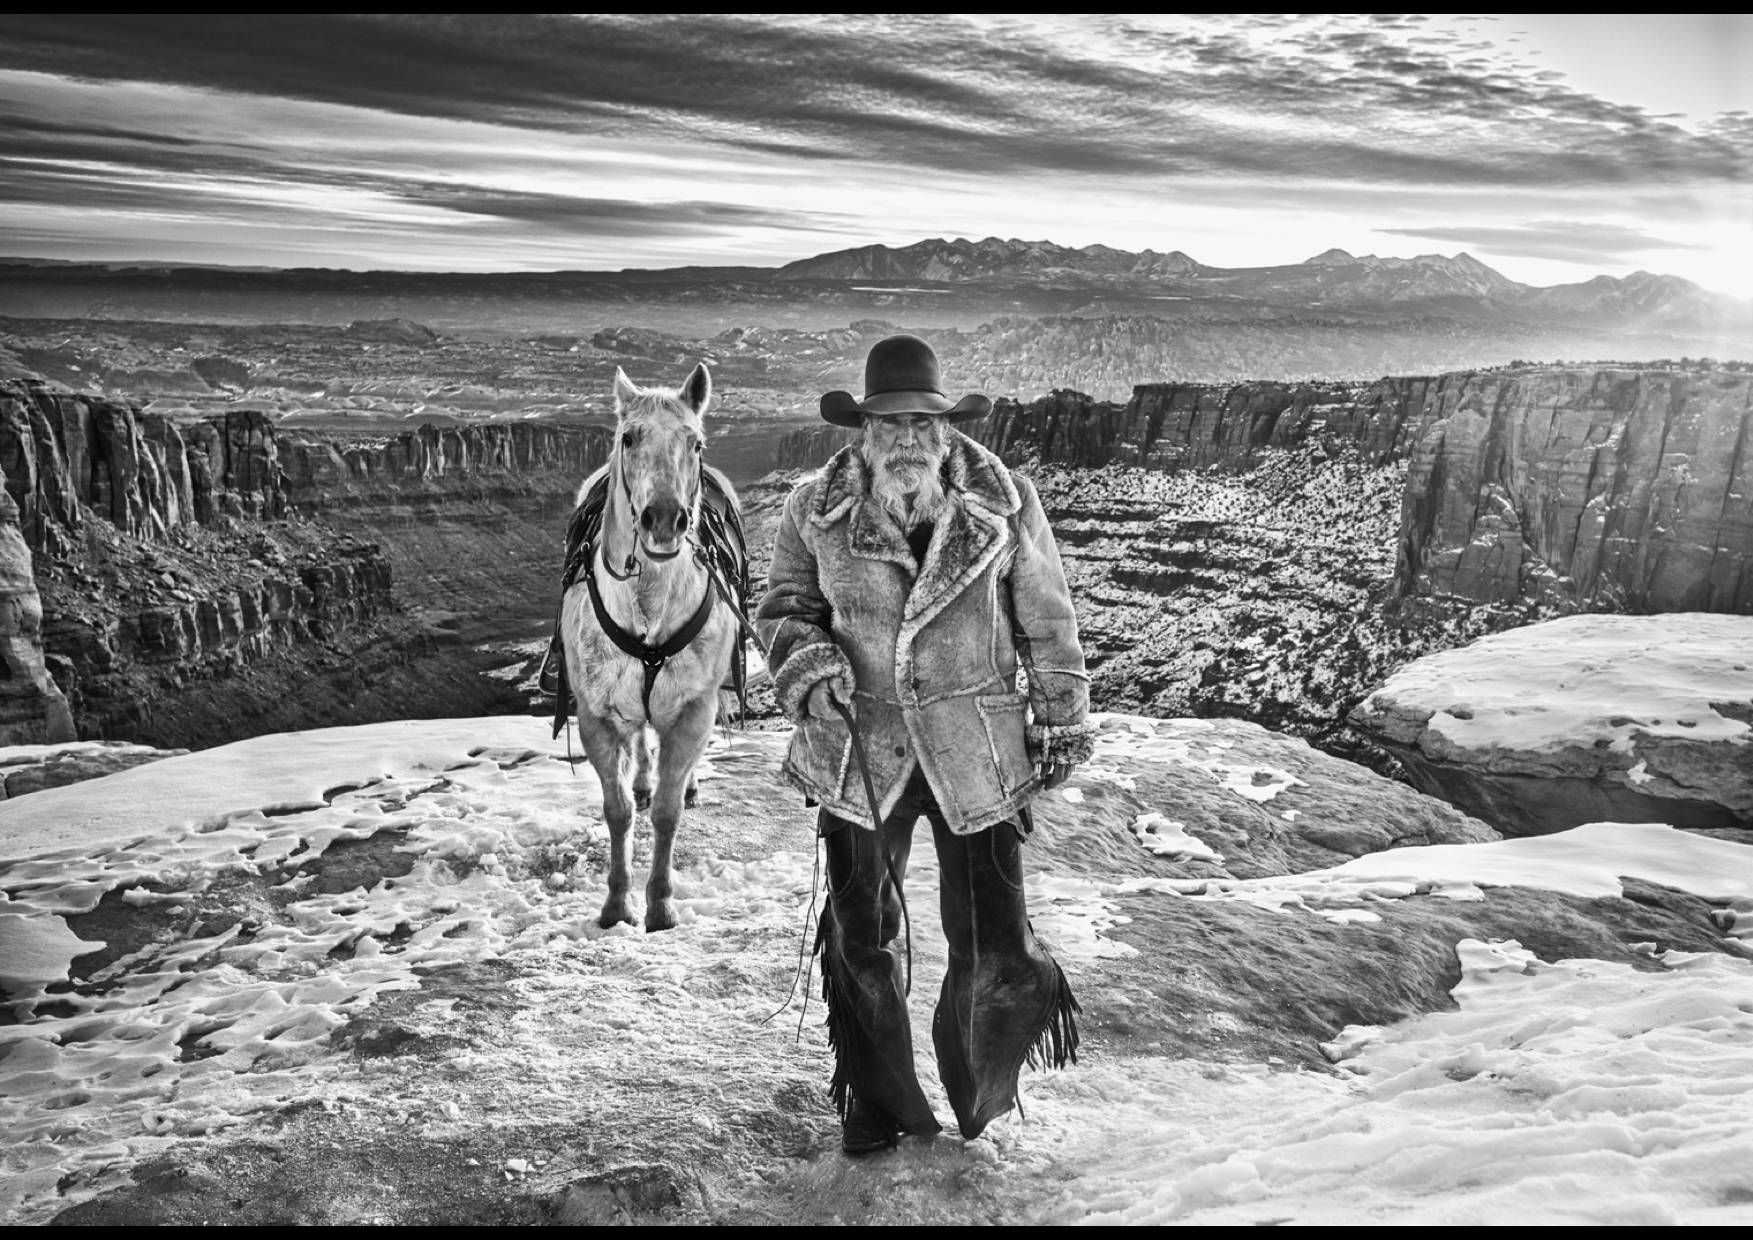 David Yarrow Photography. Sorrel Sky Gallery. Fine Art Photography. Western Photography. Super model photography. David Yarrow Prints. David Yarrow Pictures.  David Yarrow Photos. Cowboy and Horse in Canyonlands